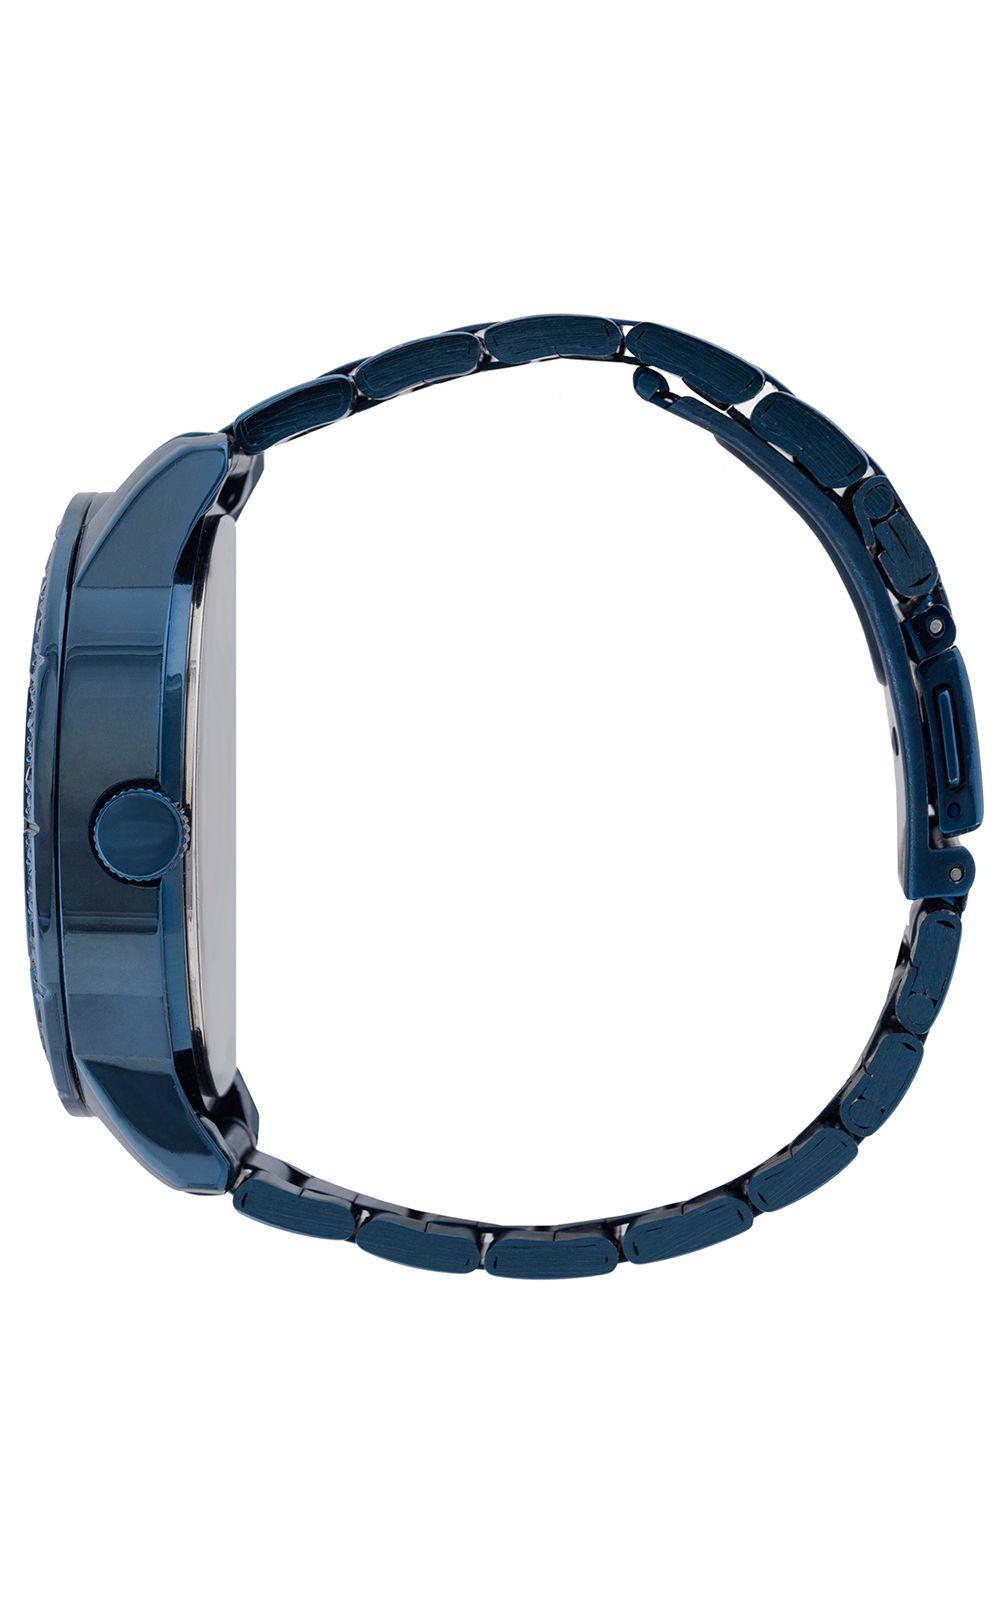 86bb45ada97 Relógio Euro Feminino On The Rocks EU2036YLR 4A - Azul. undefined